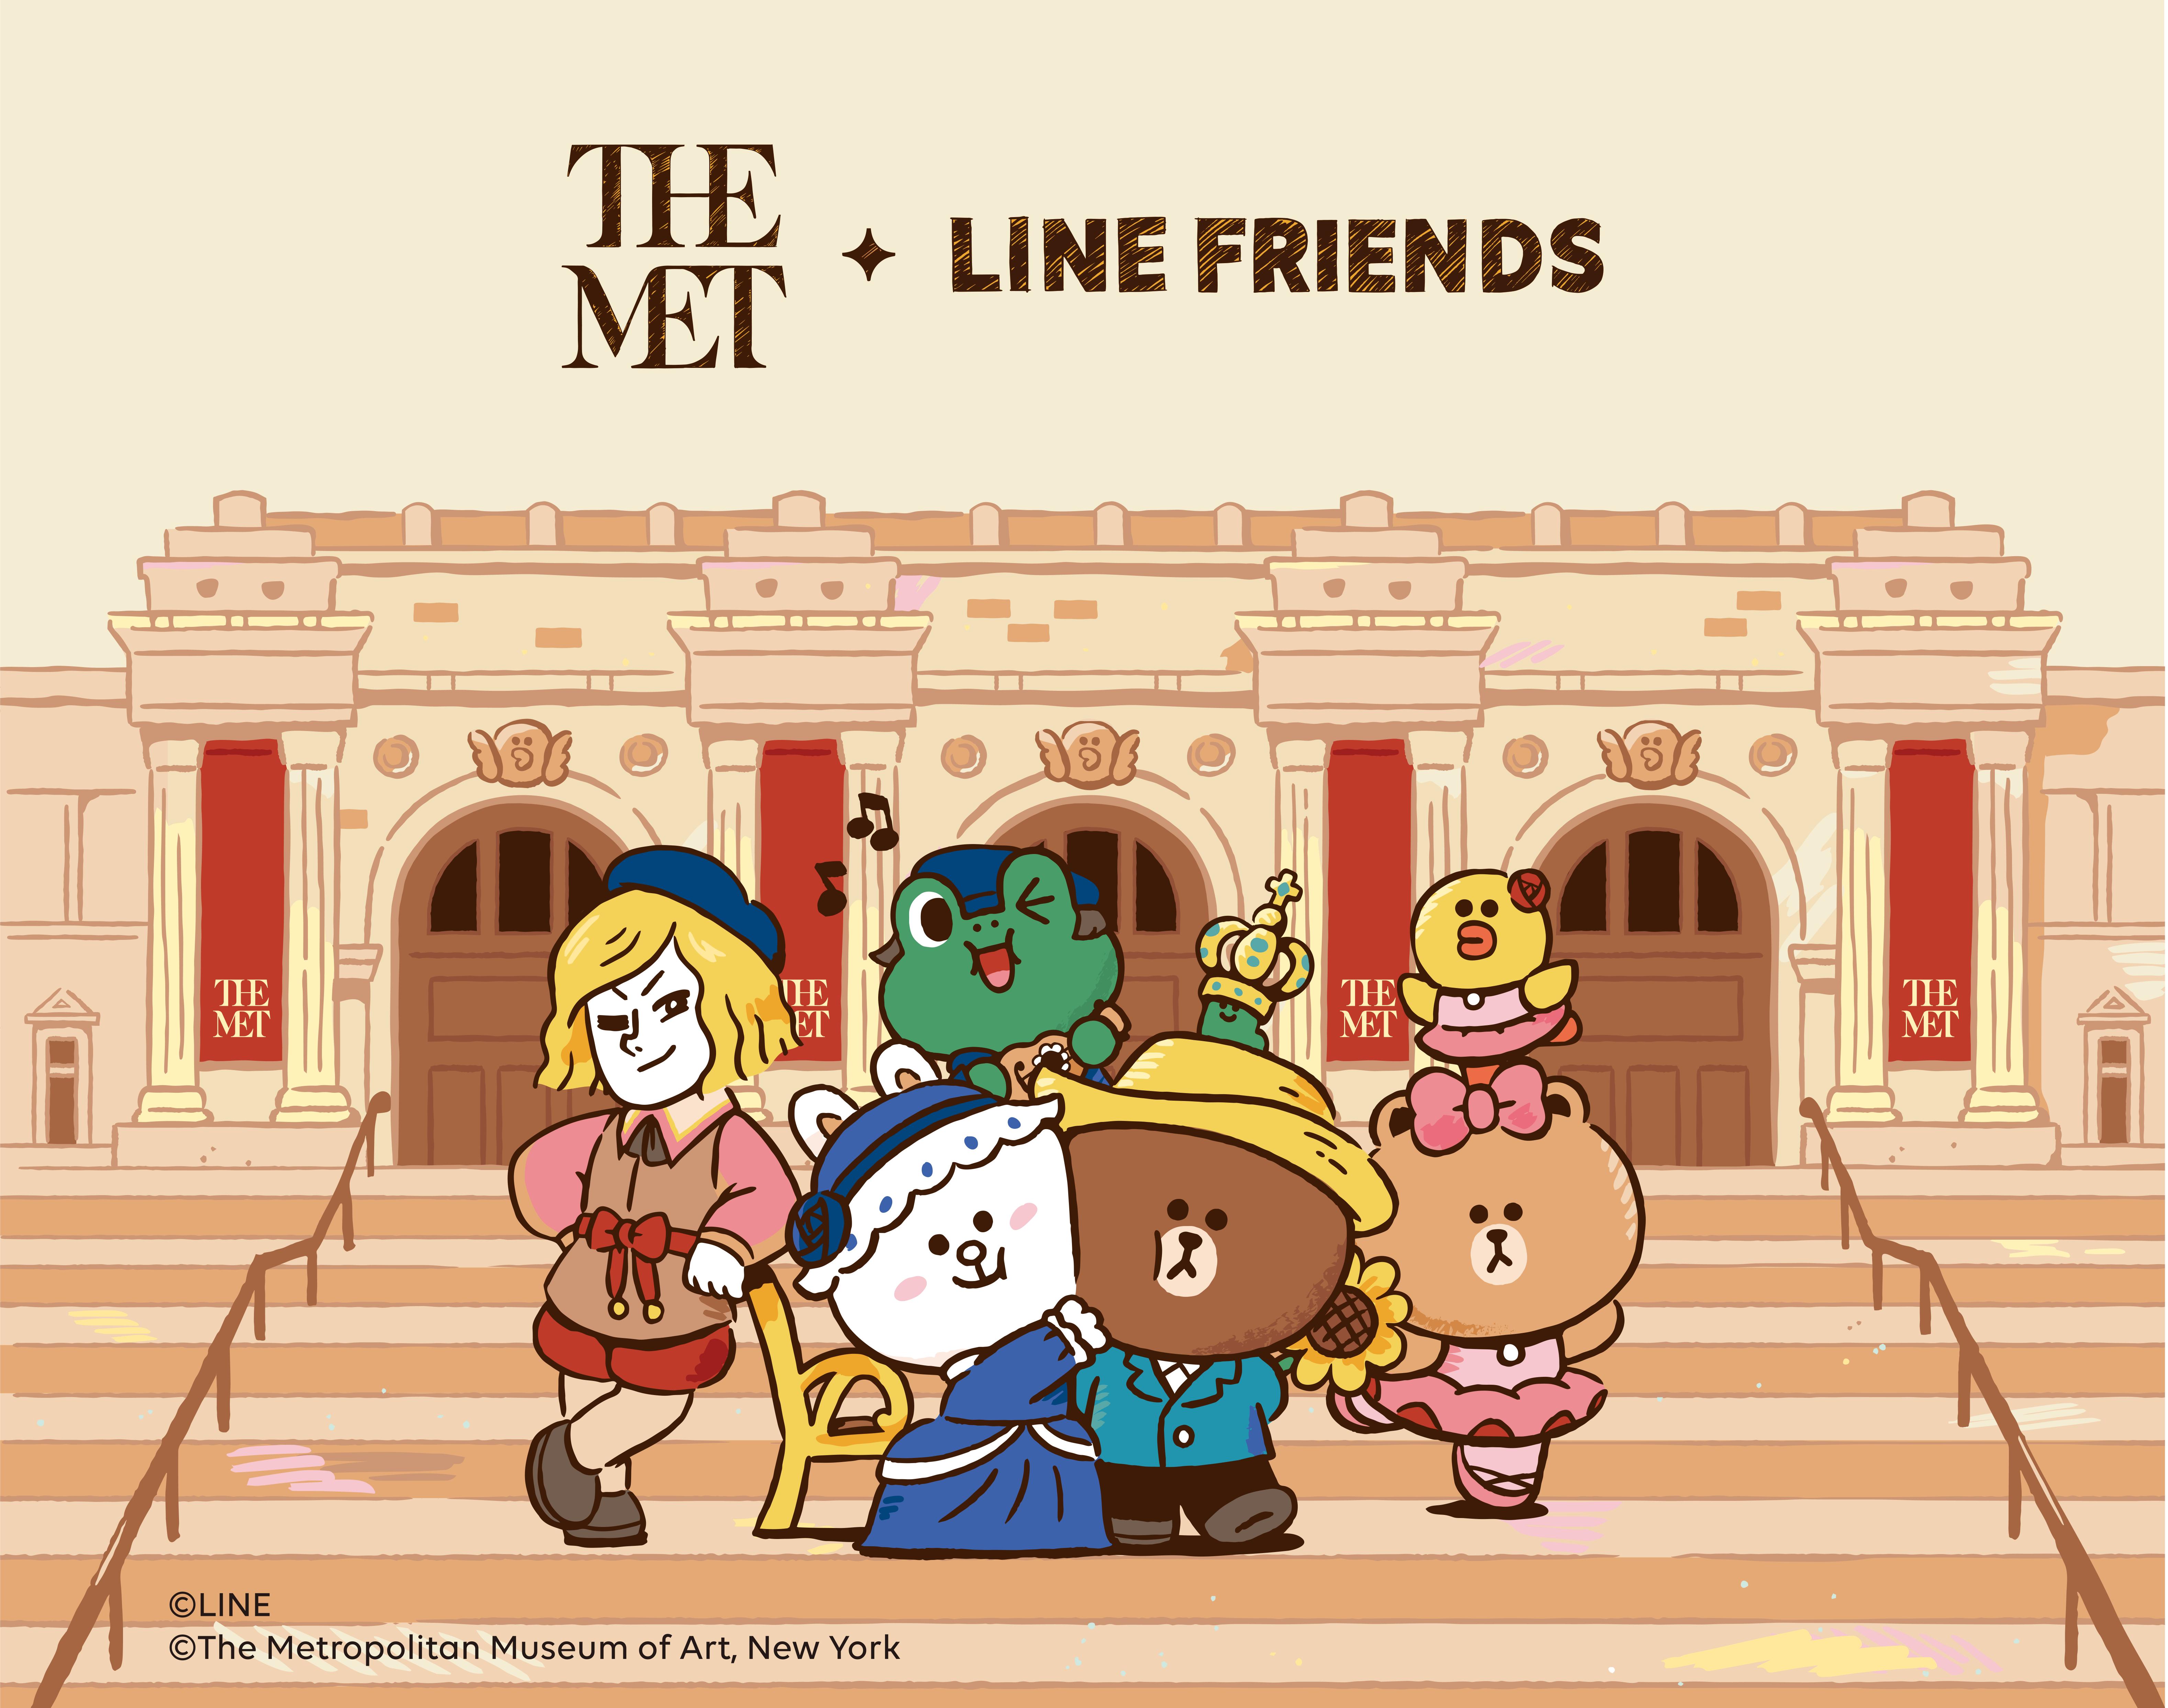 LINE FRIENDS和大都会艺术博物馆全新艺术跨界合作